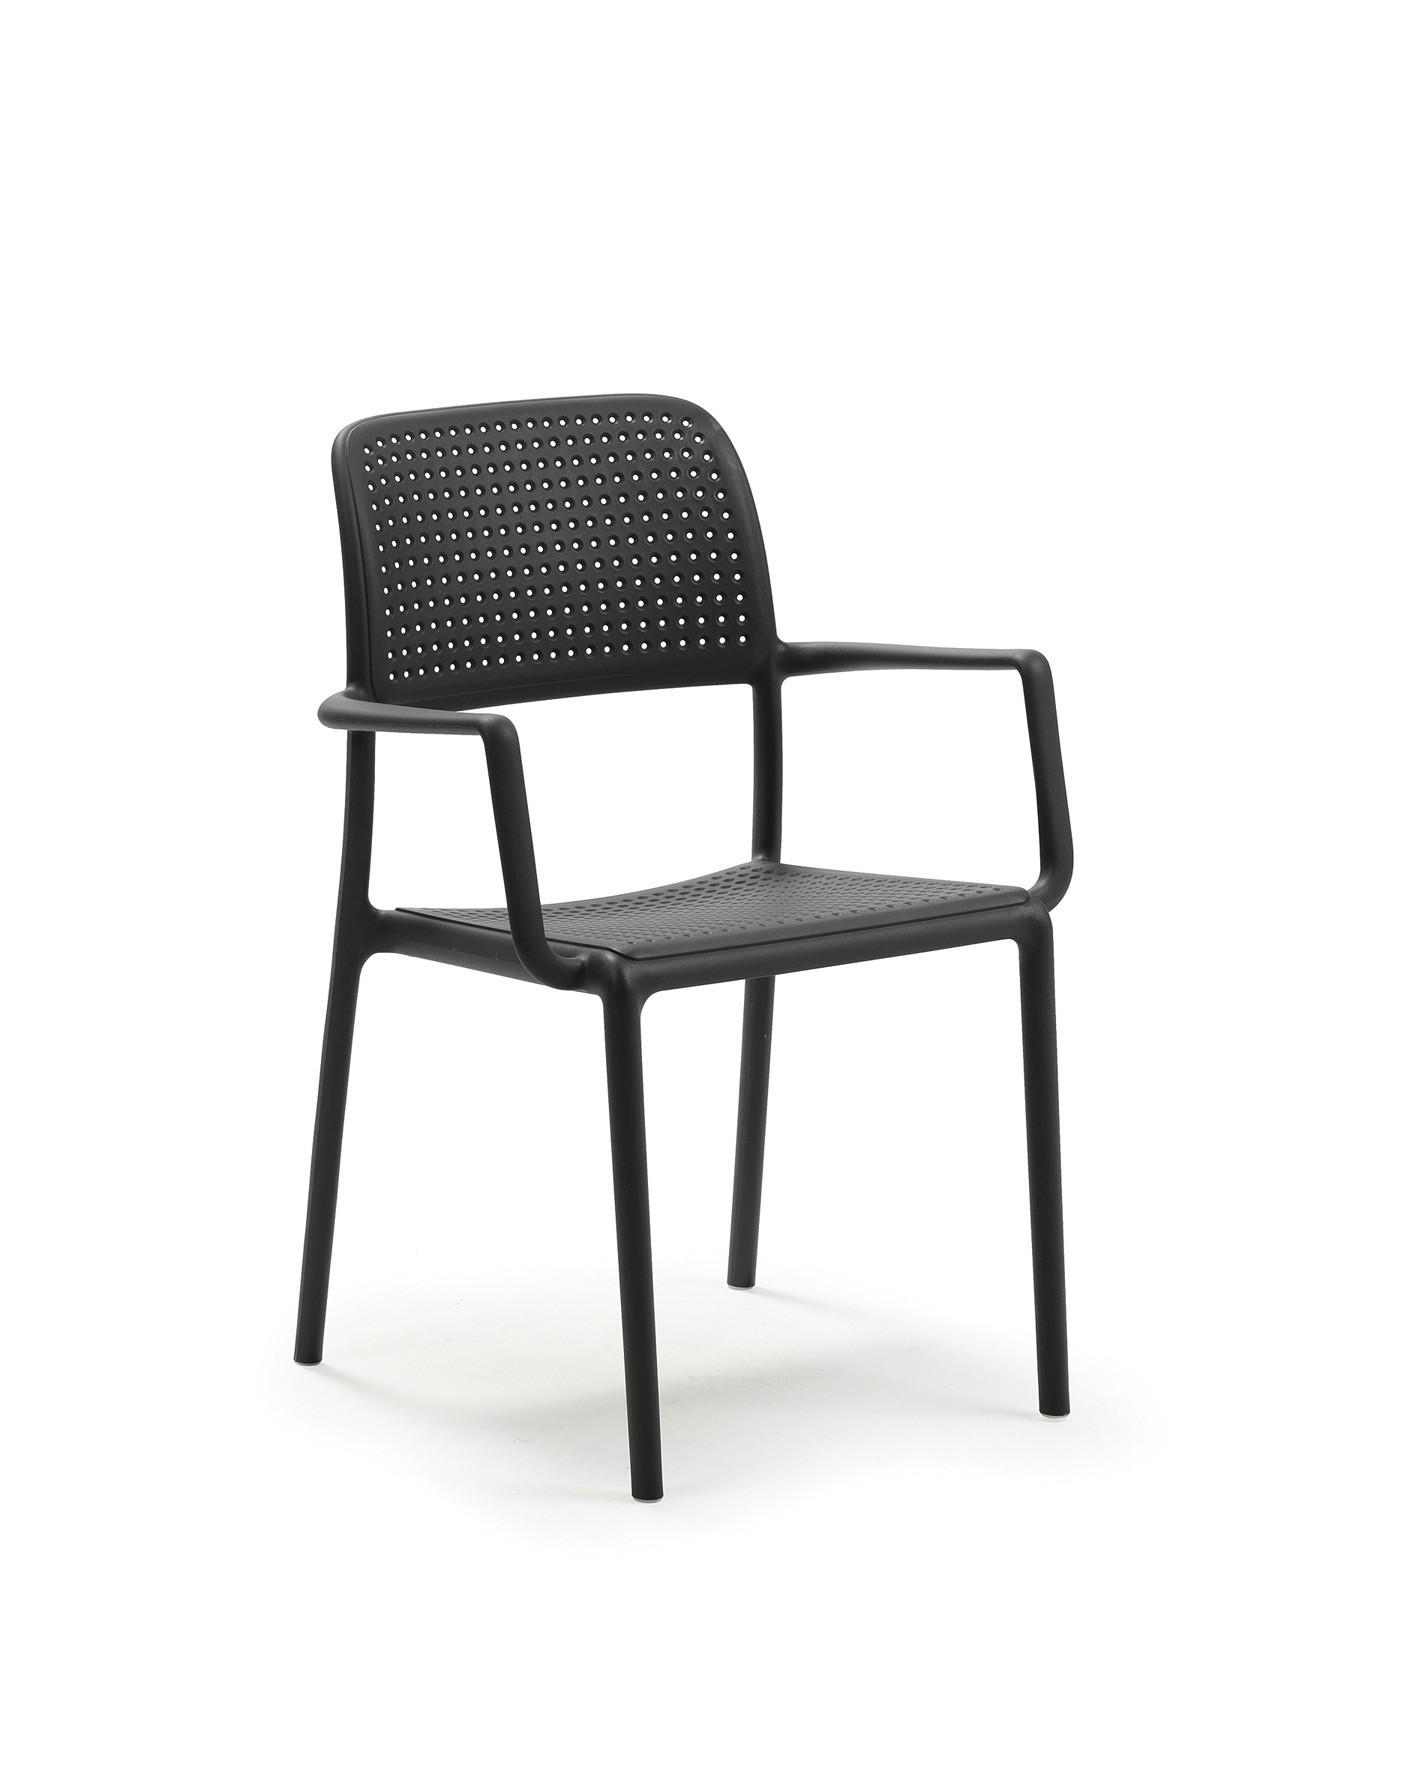 stapelstuhl gartenstuhl bora kunststoff stapelbar. Black Bedroom Furniture Sets. Home Design Ideas